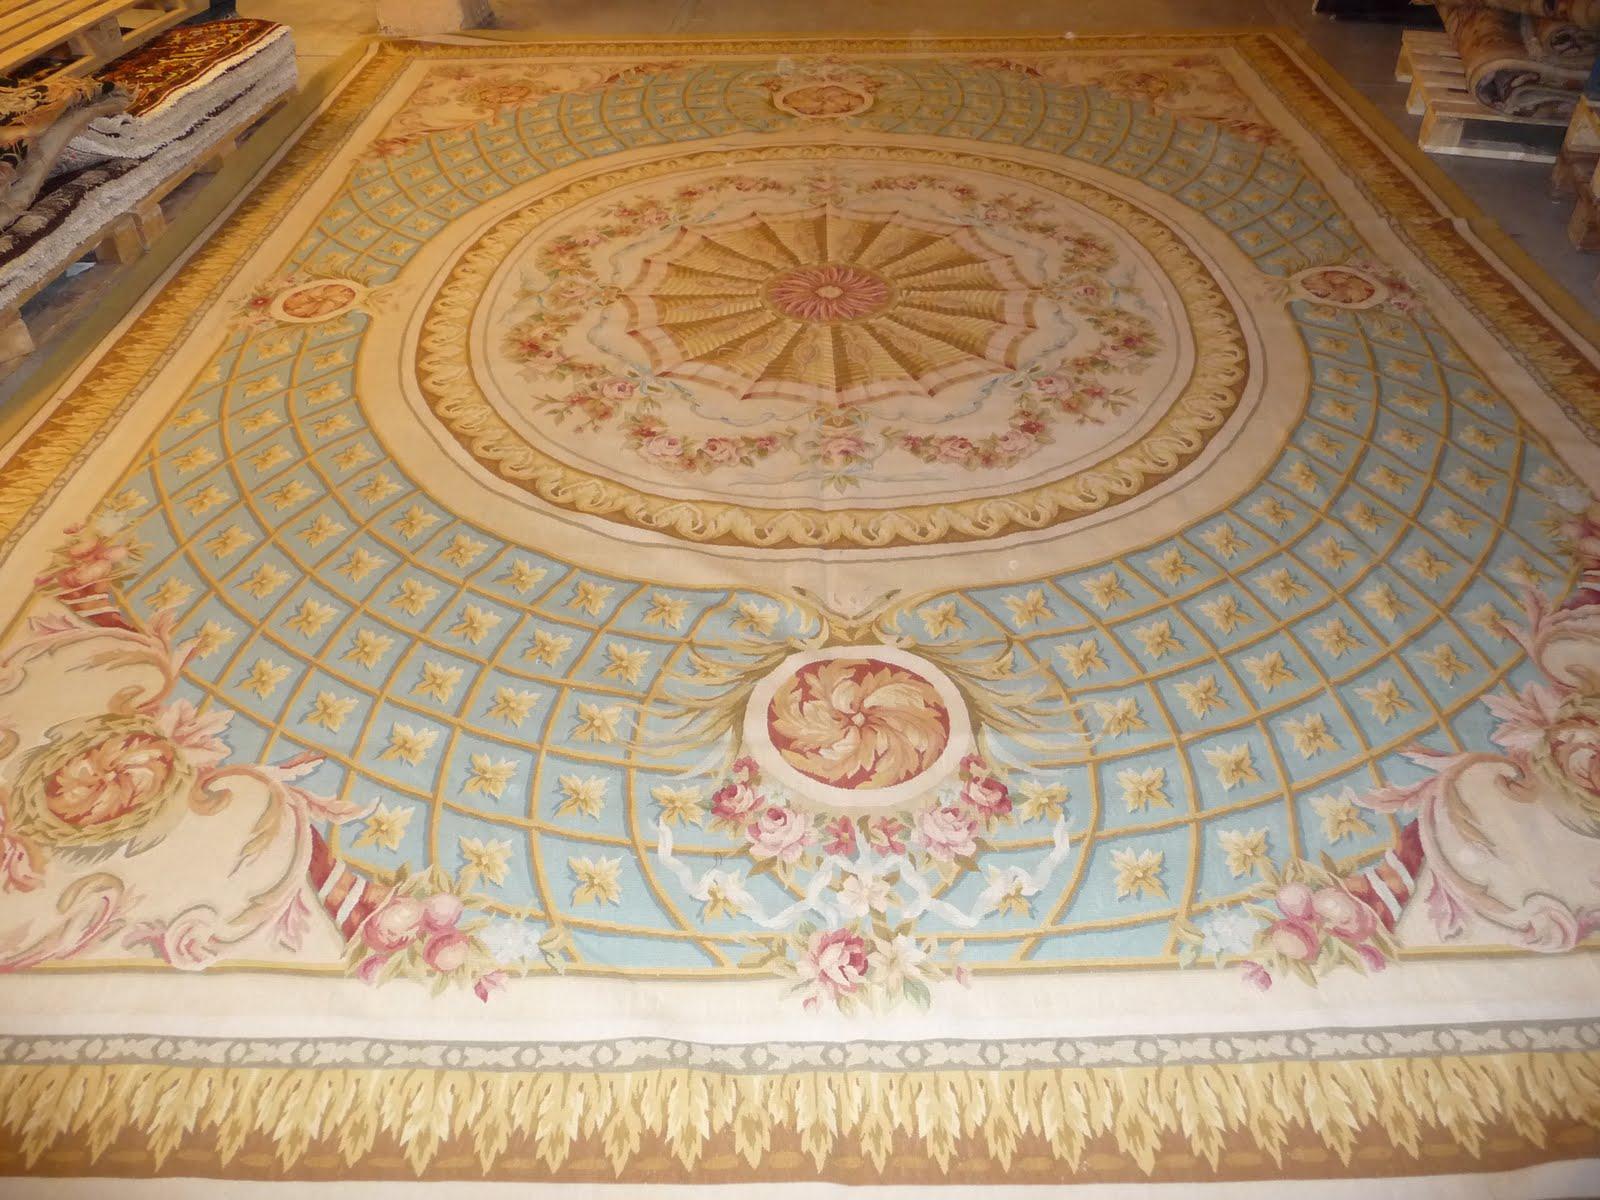 restauration de tapis tapisserie savonnerie et lavage. Black Bedroom Furniture Sets. Home Design Ideas